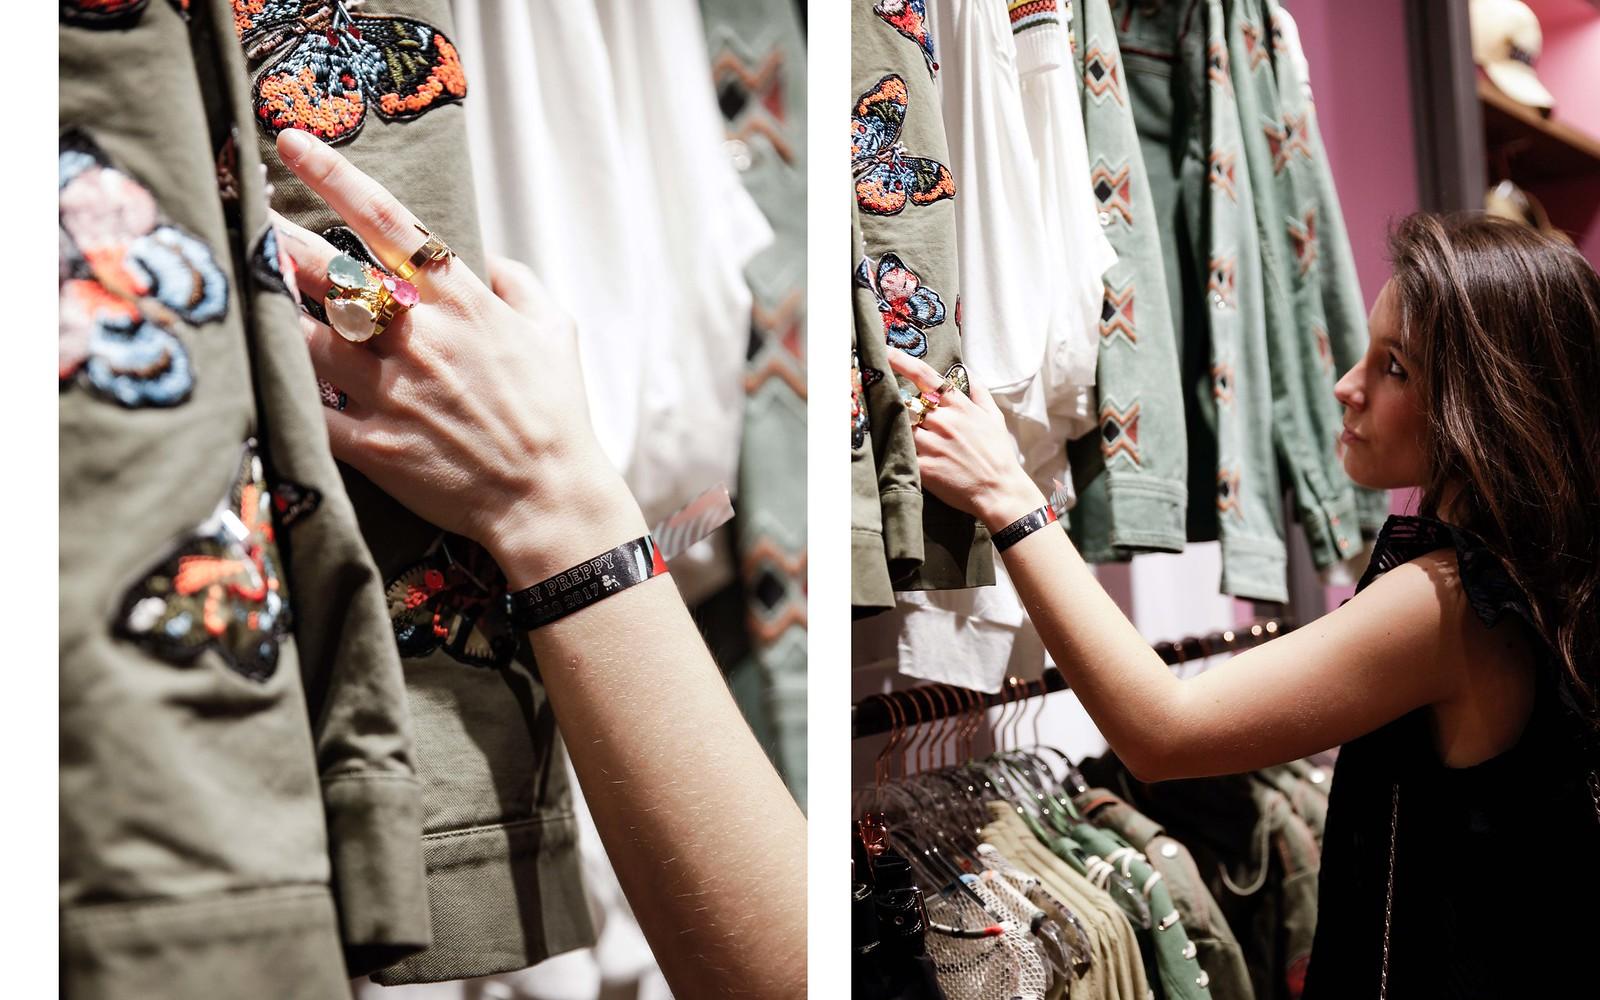 011_Highly_Preppy_abre_su_primera_tienda_en_Bilbao_influencers_fashion_lifestyle_theguestgirl_look_military_khaki_ootd